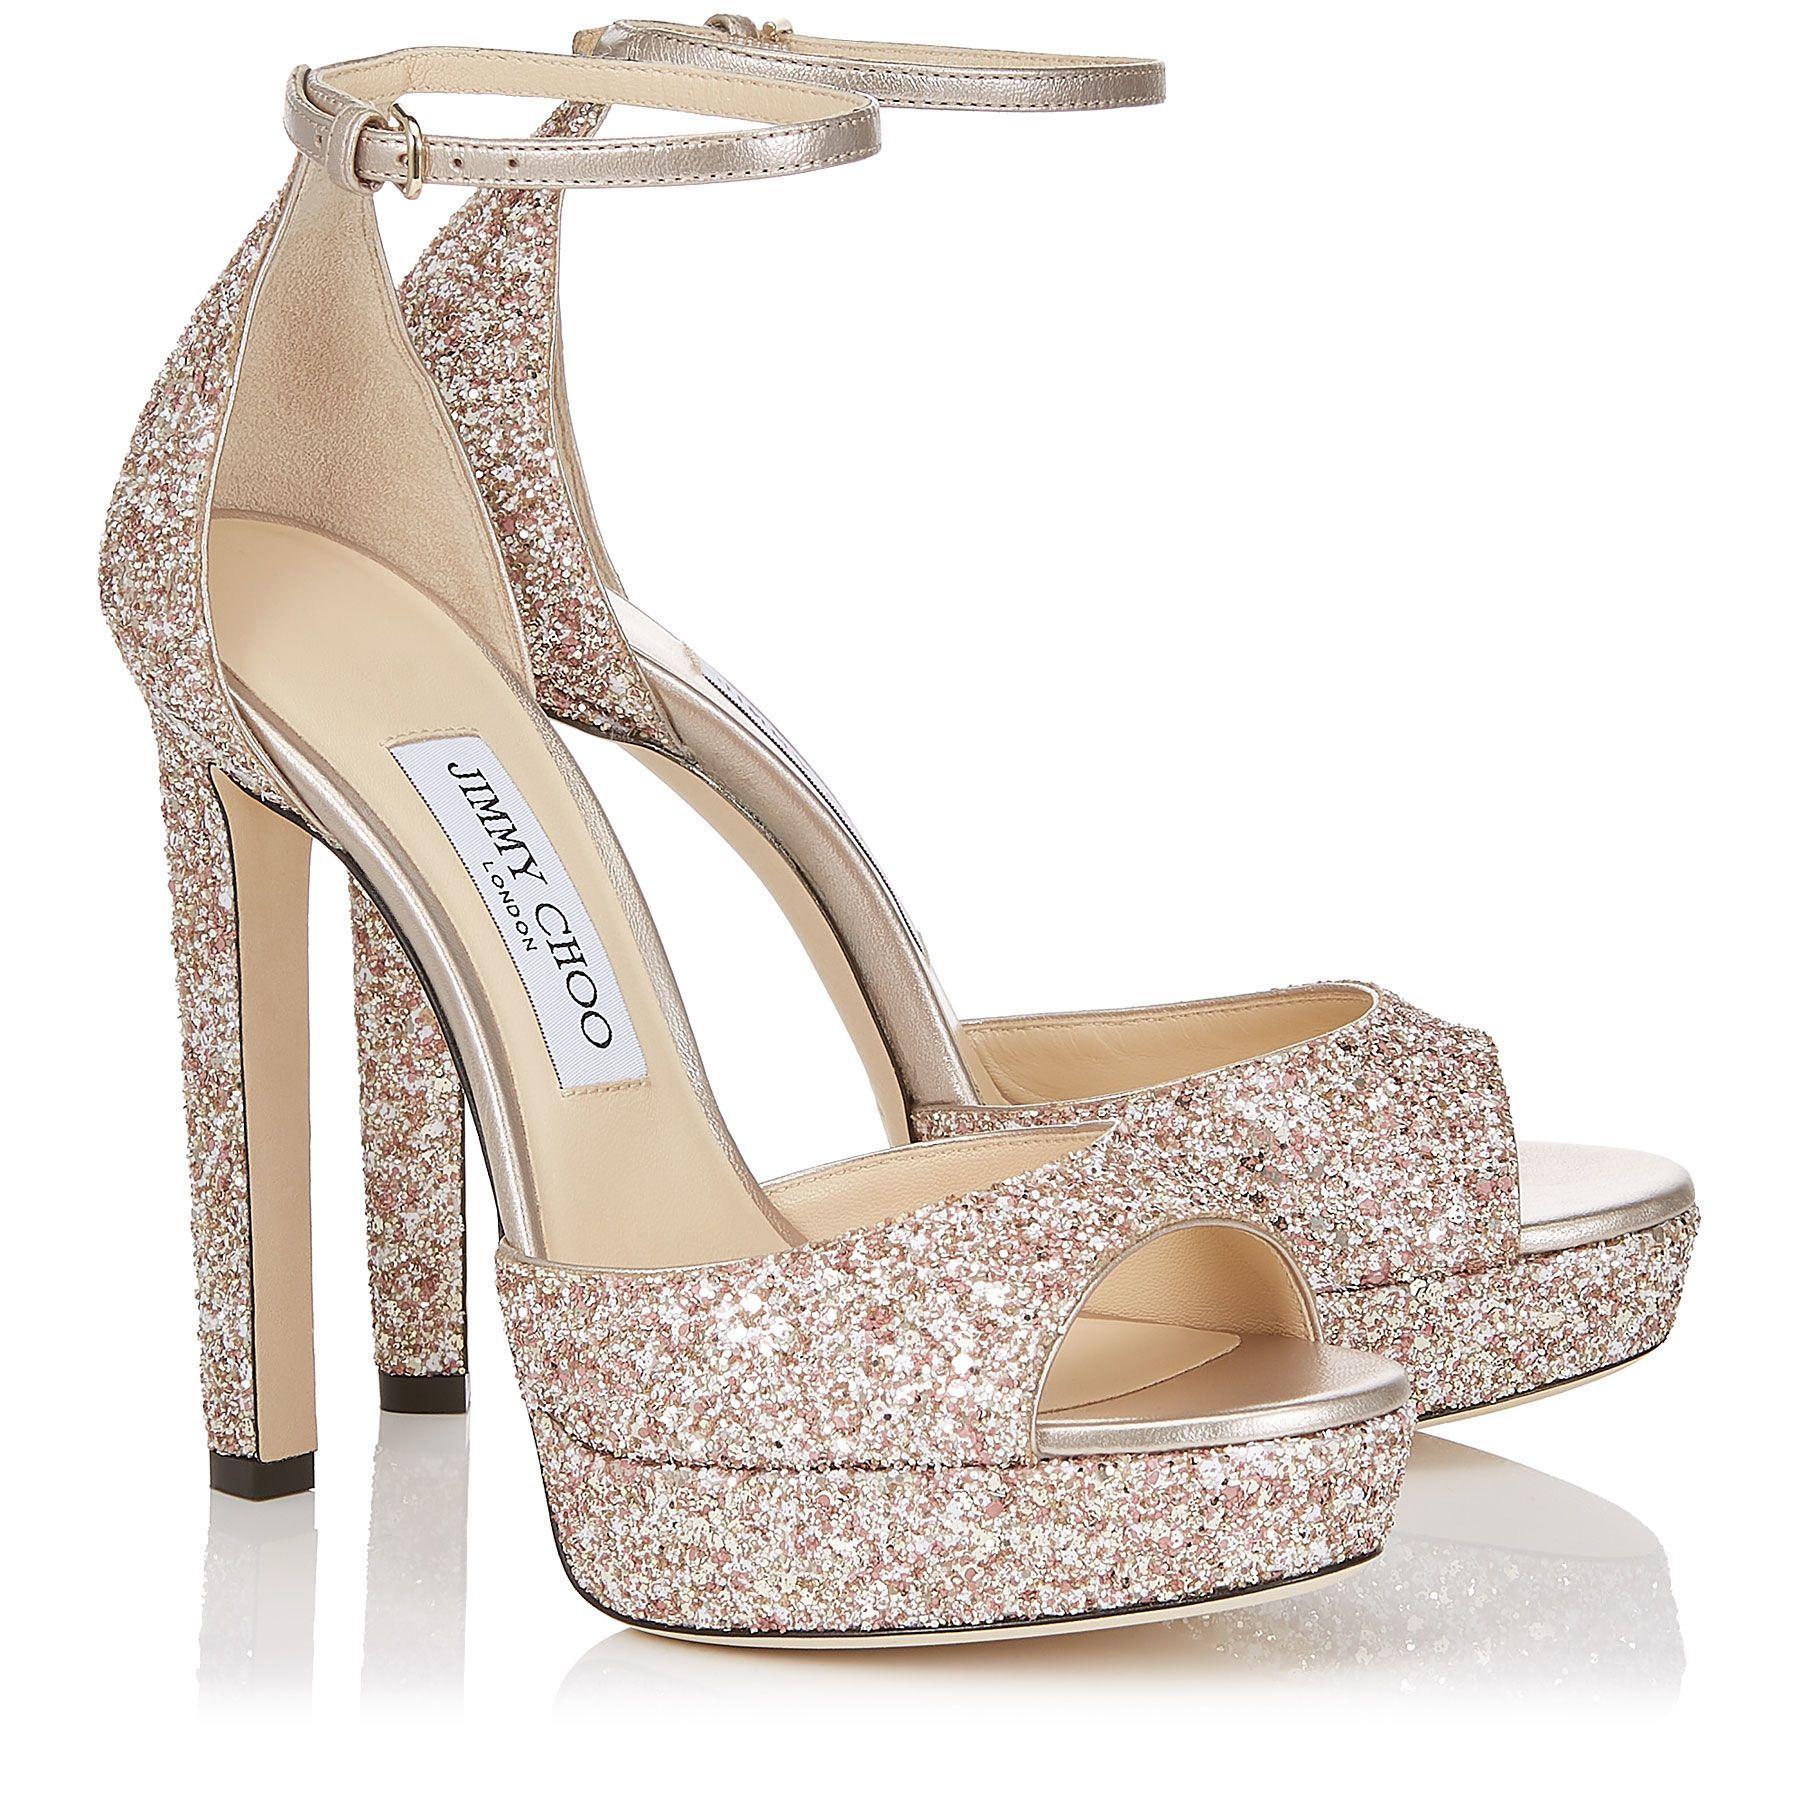 39+ Platform wedding shoes comfortable ideas